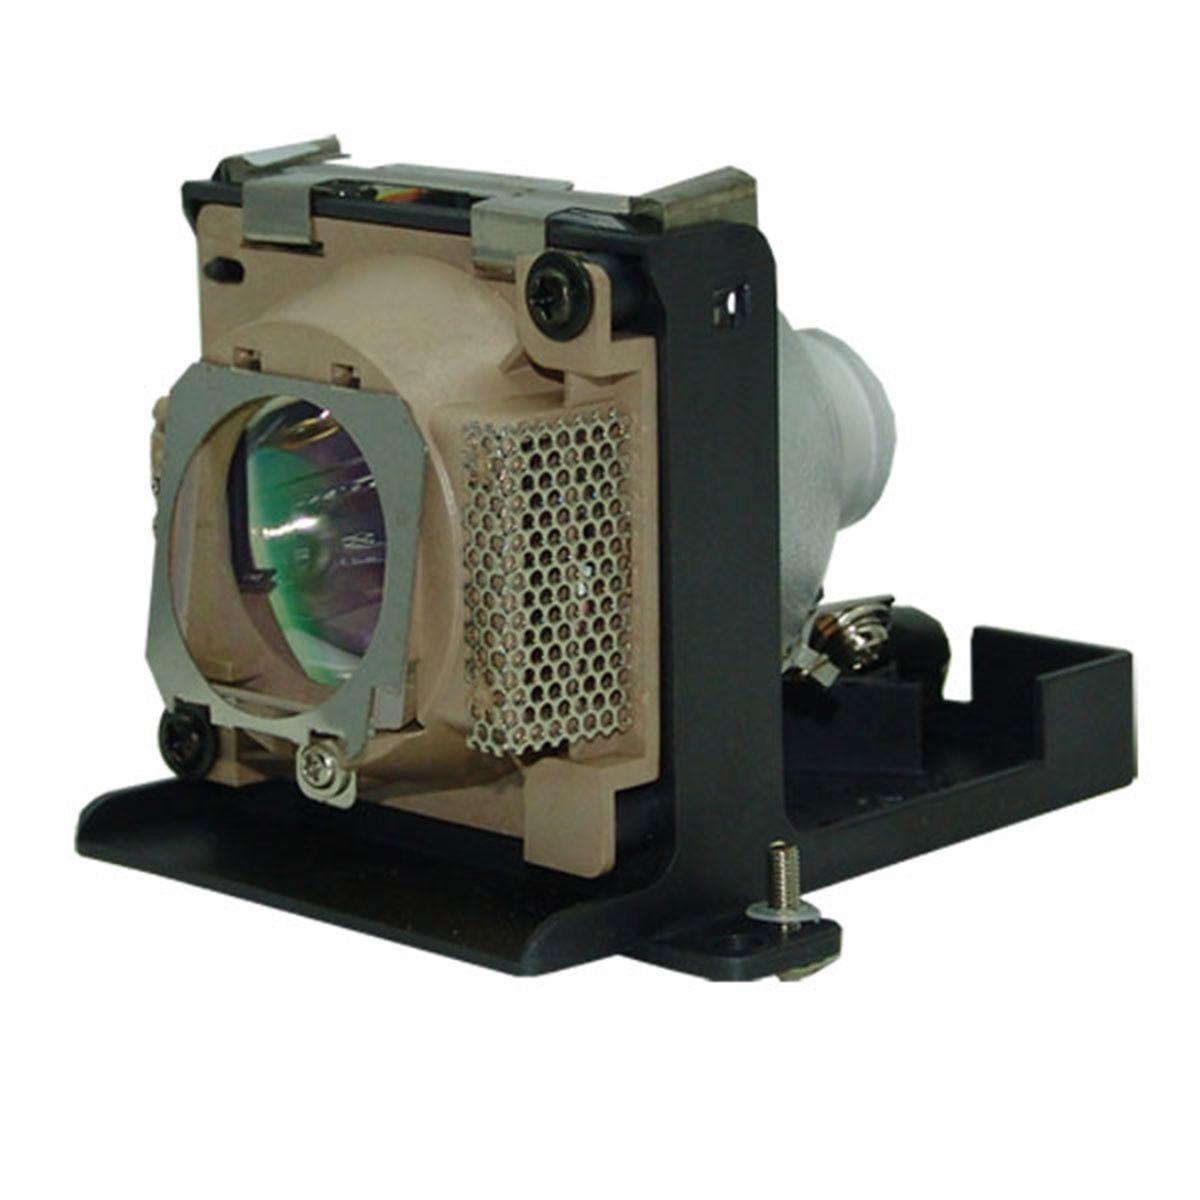 Projector Lamp Bulb 59.J9401.CG1 for BENQ PB8140 PB8240 PE8140 PE8240 with housingProjector Lamp Bulb 59.J9401.CG1 for BENQ PB8140 PB8240 PE8140 PE8240 with housing